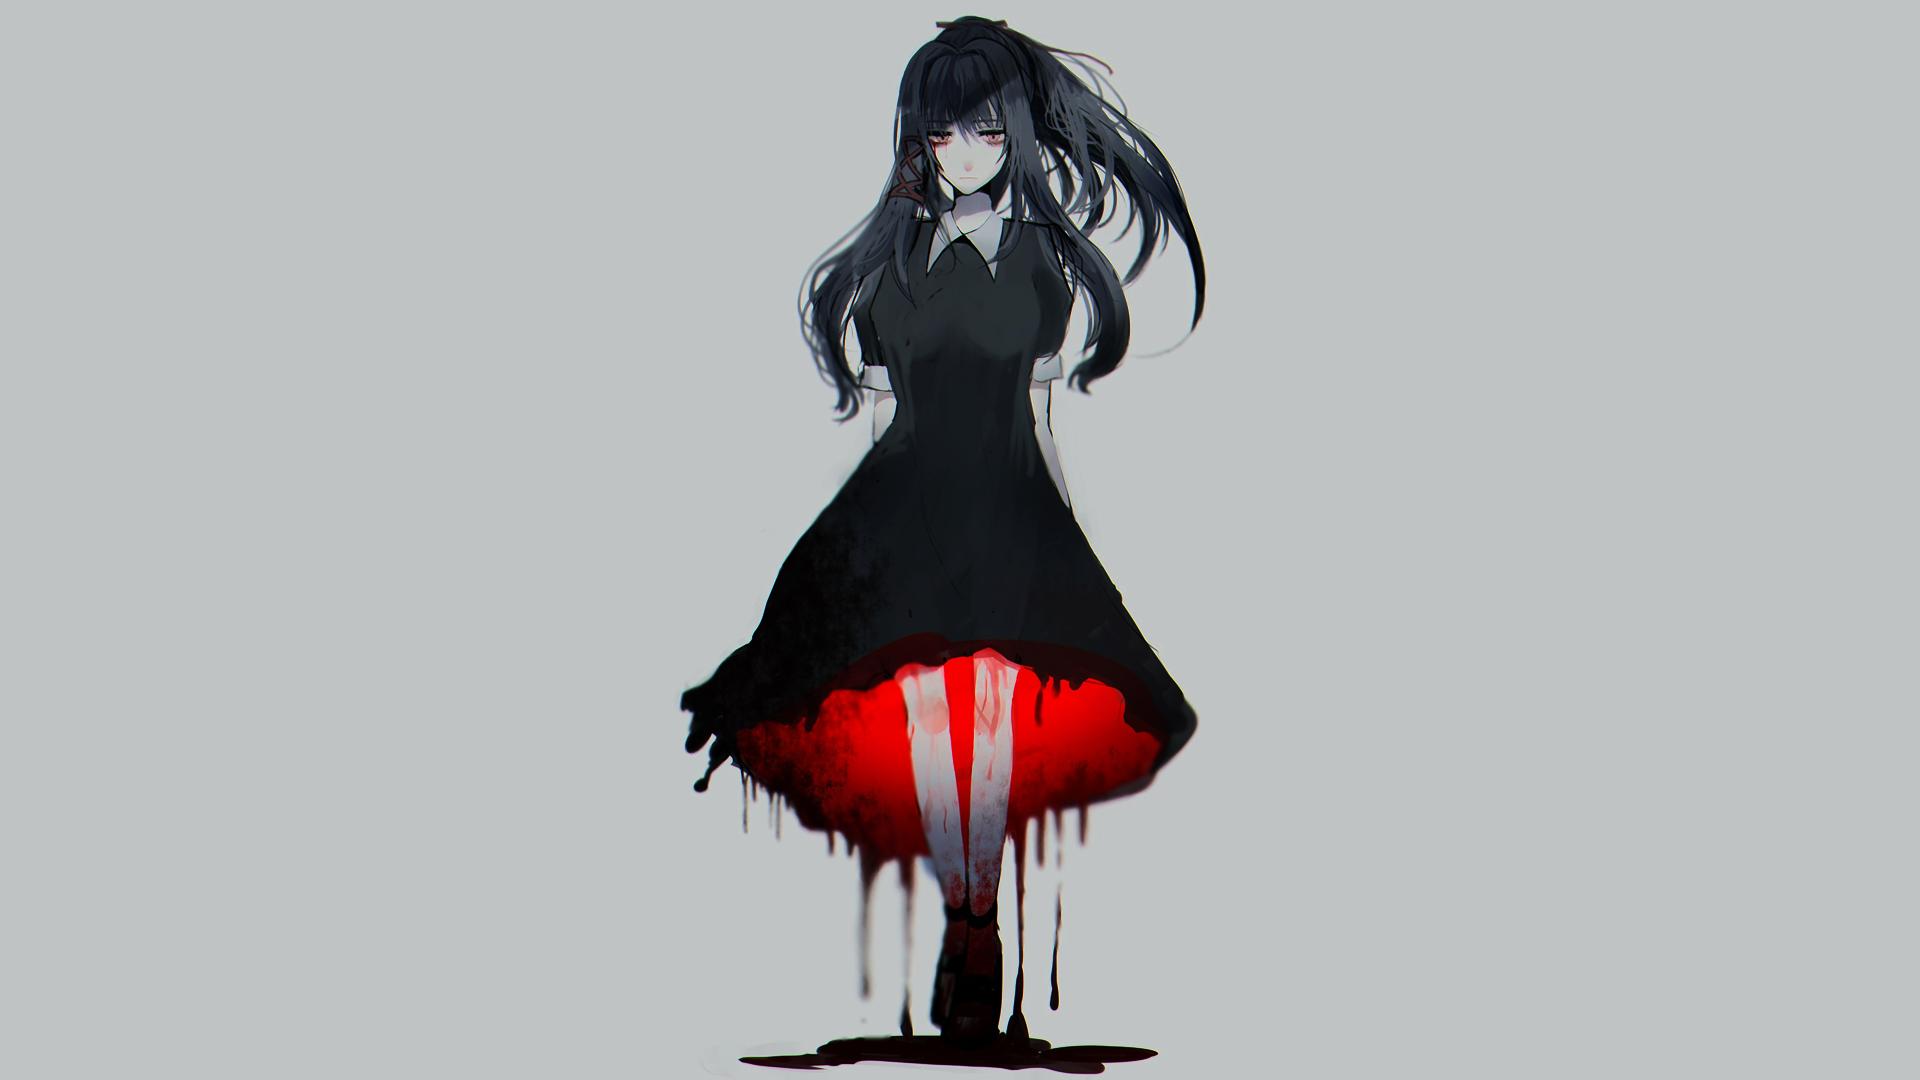 Anime 1920x1080 anime manga anime girls simple background minimalism gray blood gloomy red eyes turquoise hair